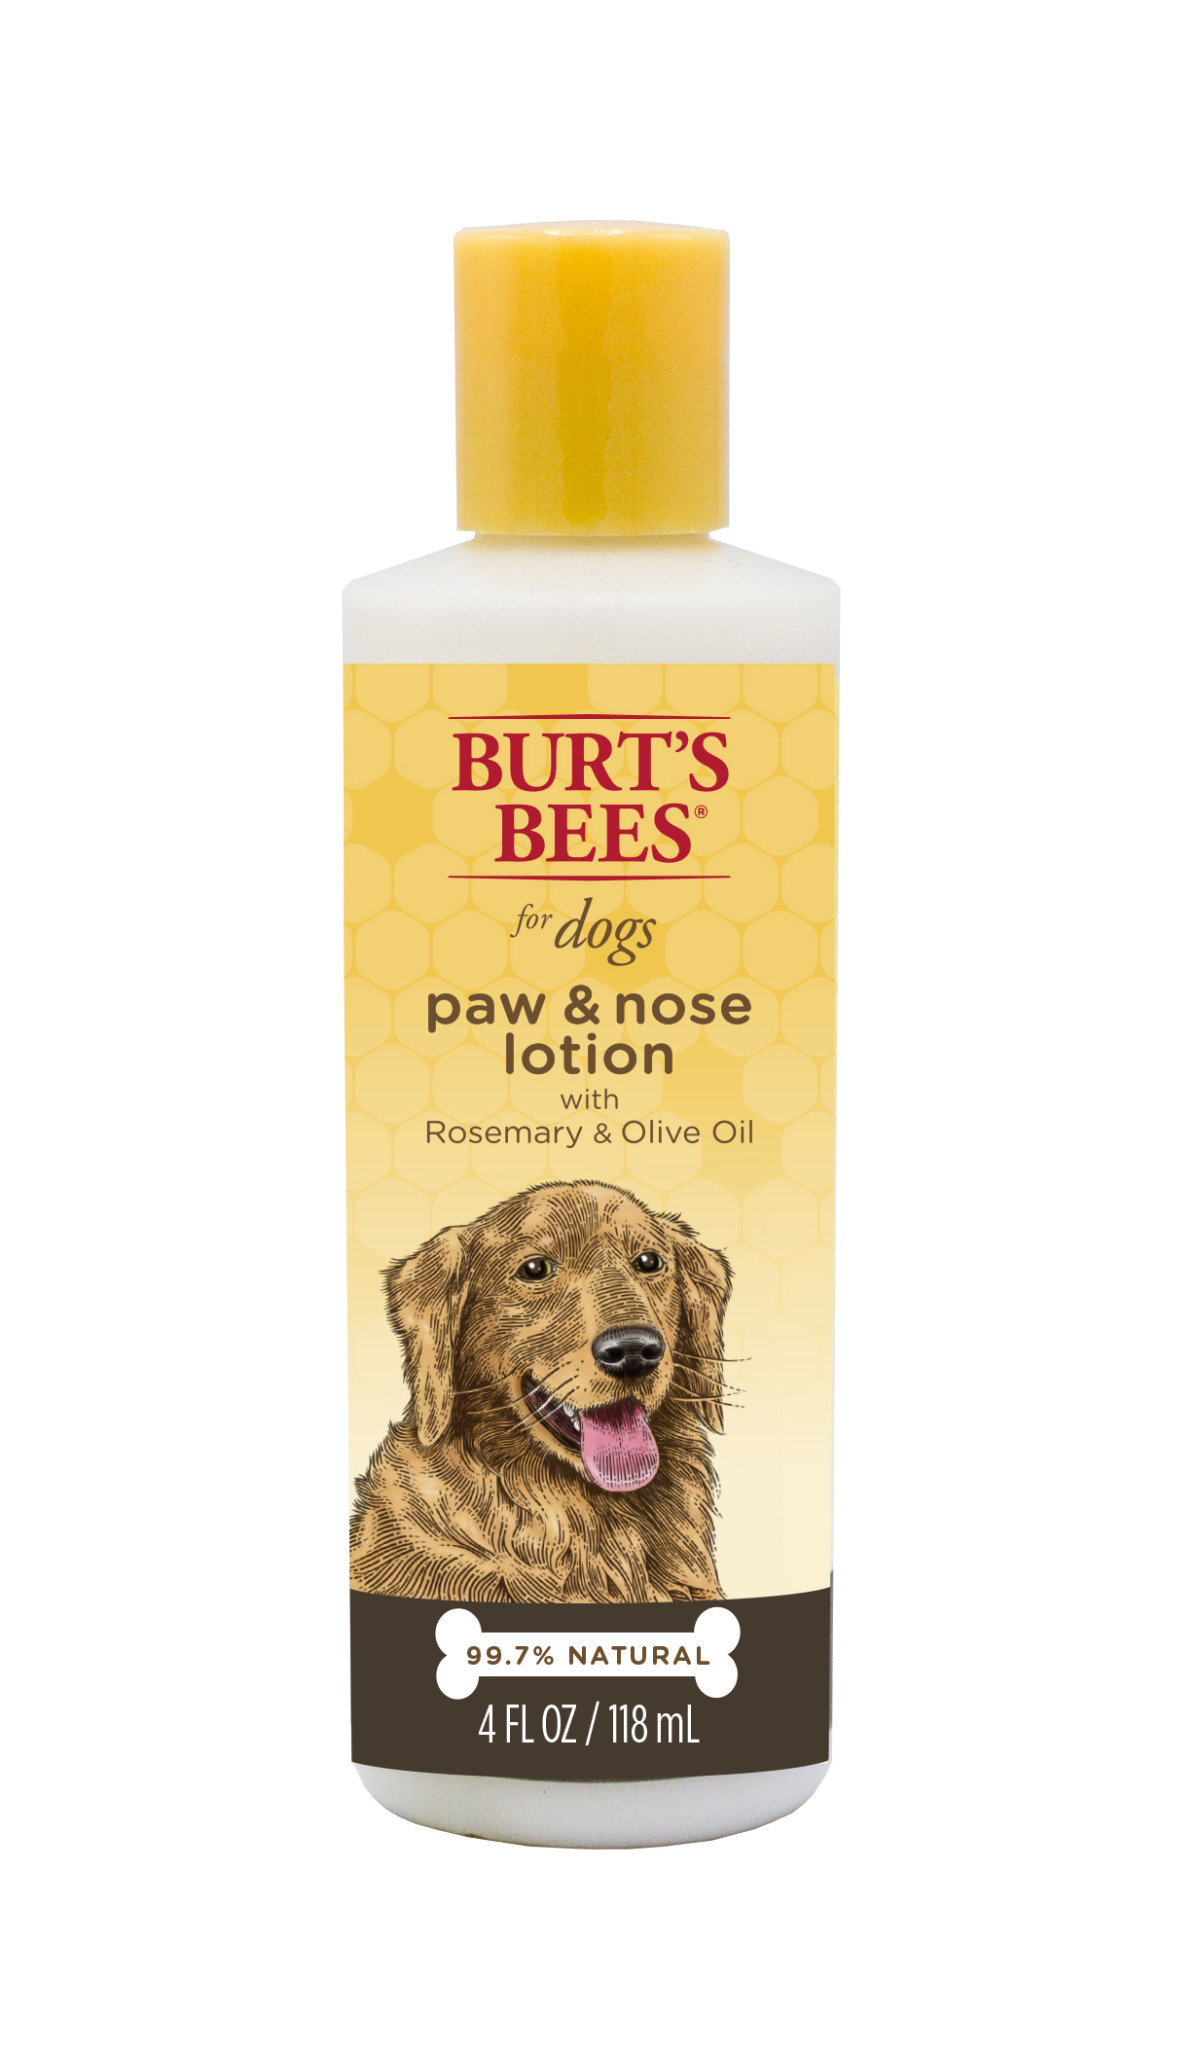 Burt's Bees Burt's Bees Paw Nose Lotion 4 oz